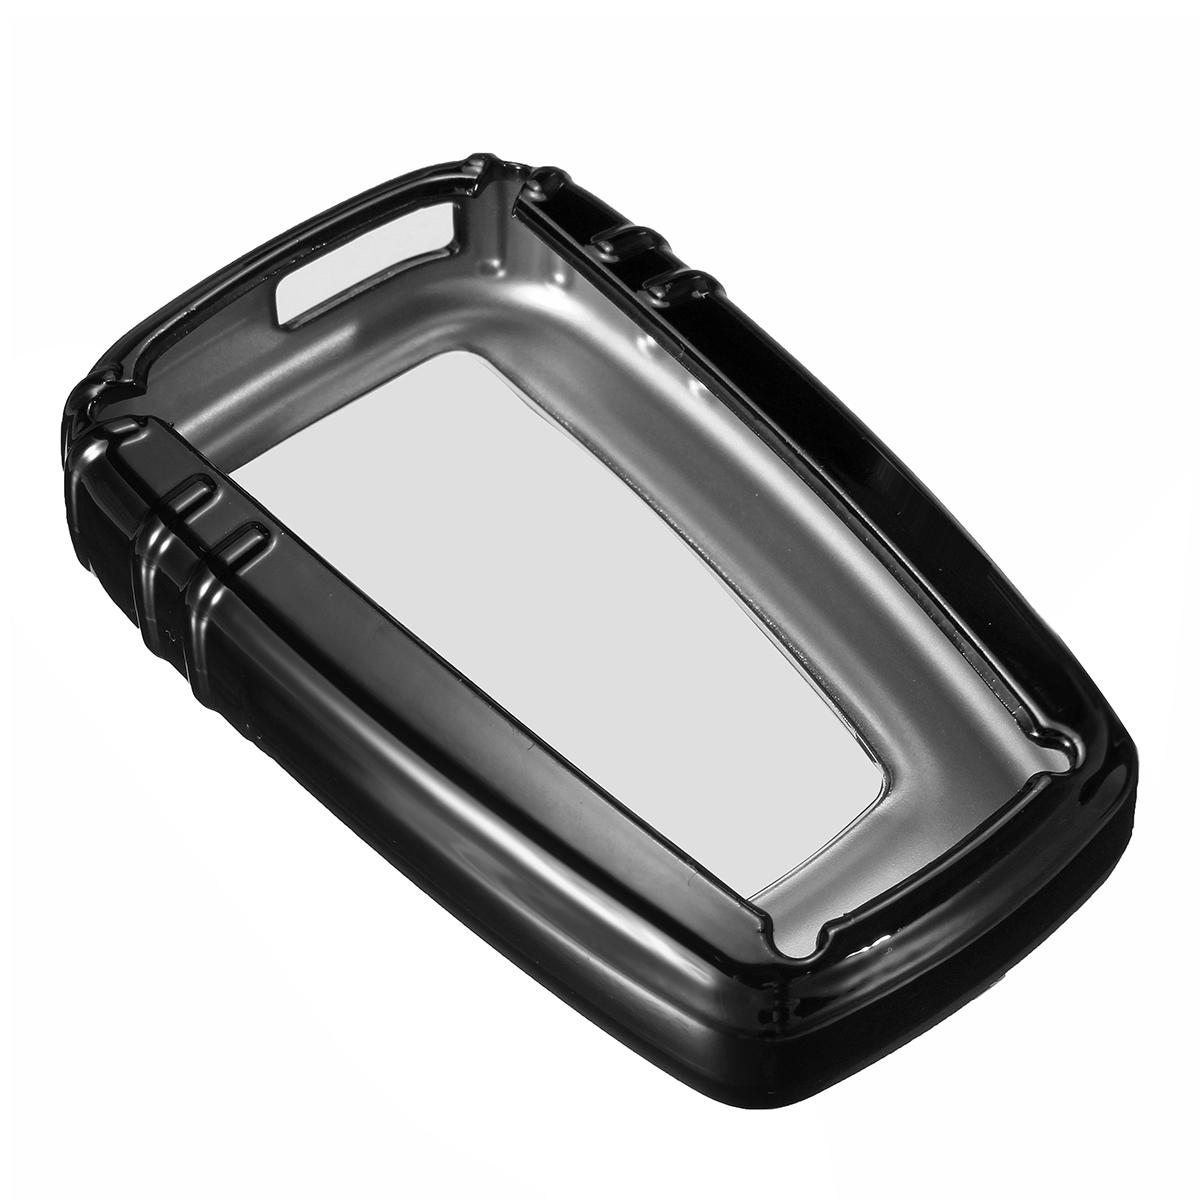 Smart Remote Key Case Cover Fob Holder For Toyota Camry CHR Prius Avalon RAV4 Corolla